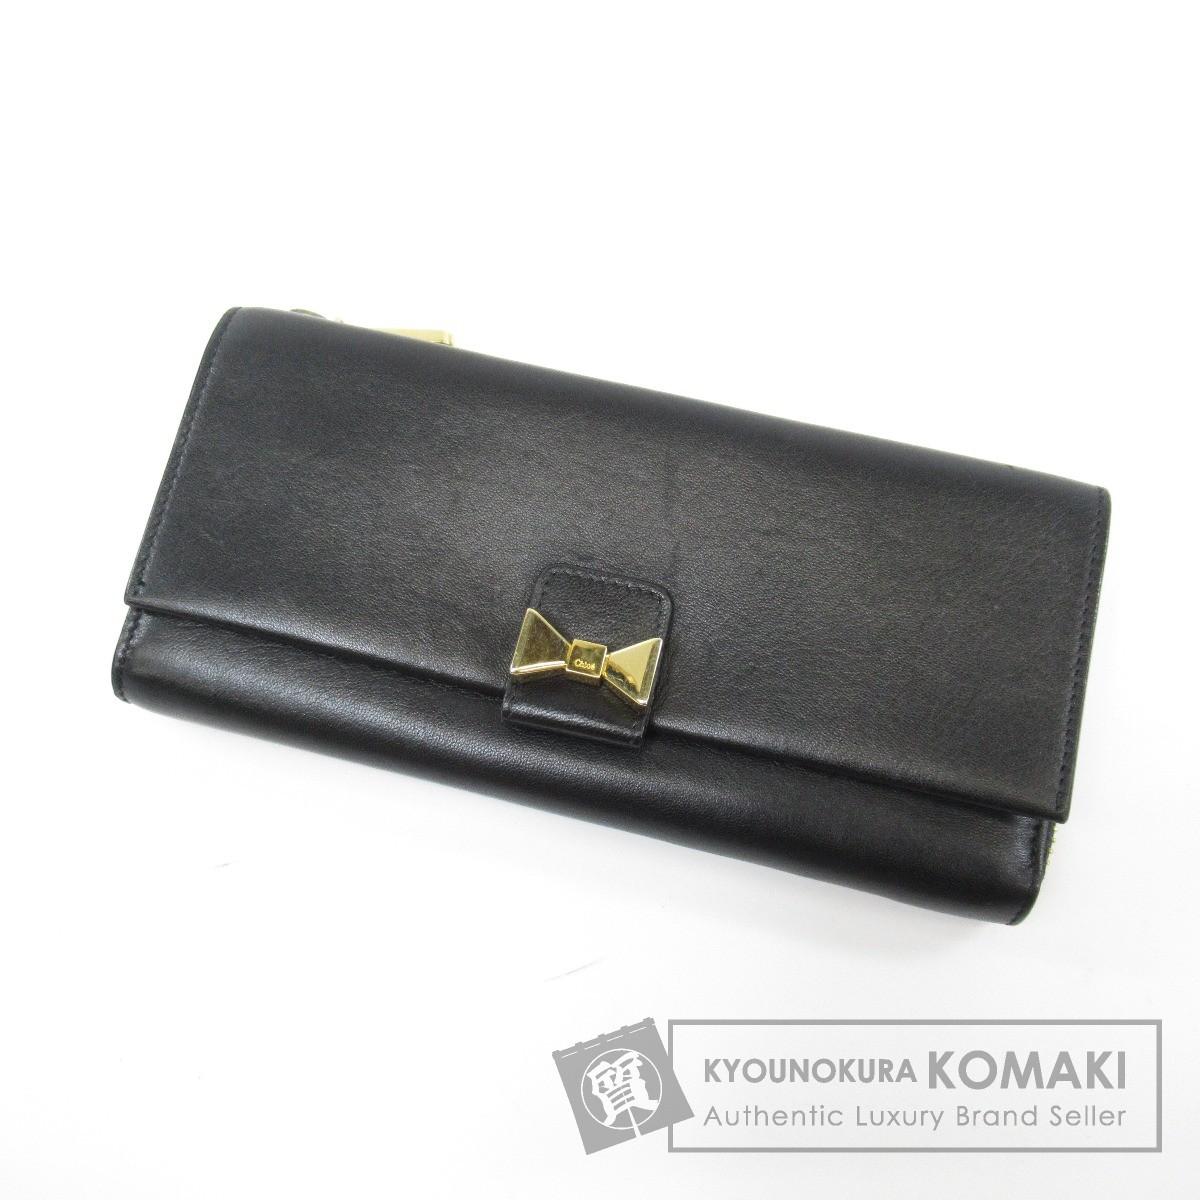 CHLOE リボンモチーフ 長財布(小銭入れあり) レザー レディース 【中古】【クロエ】